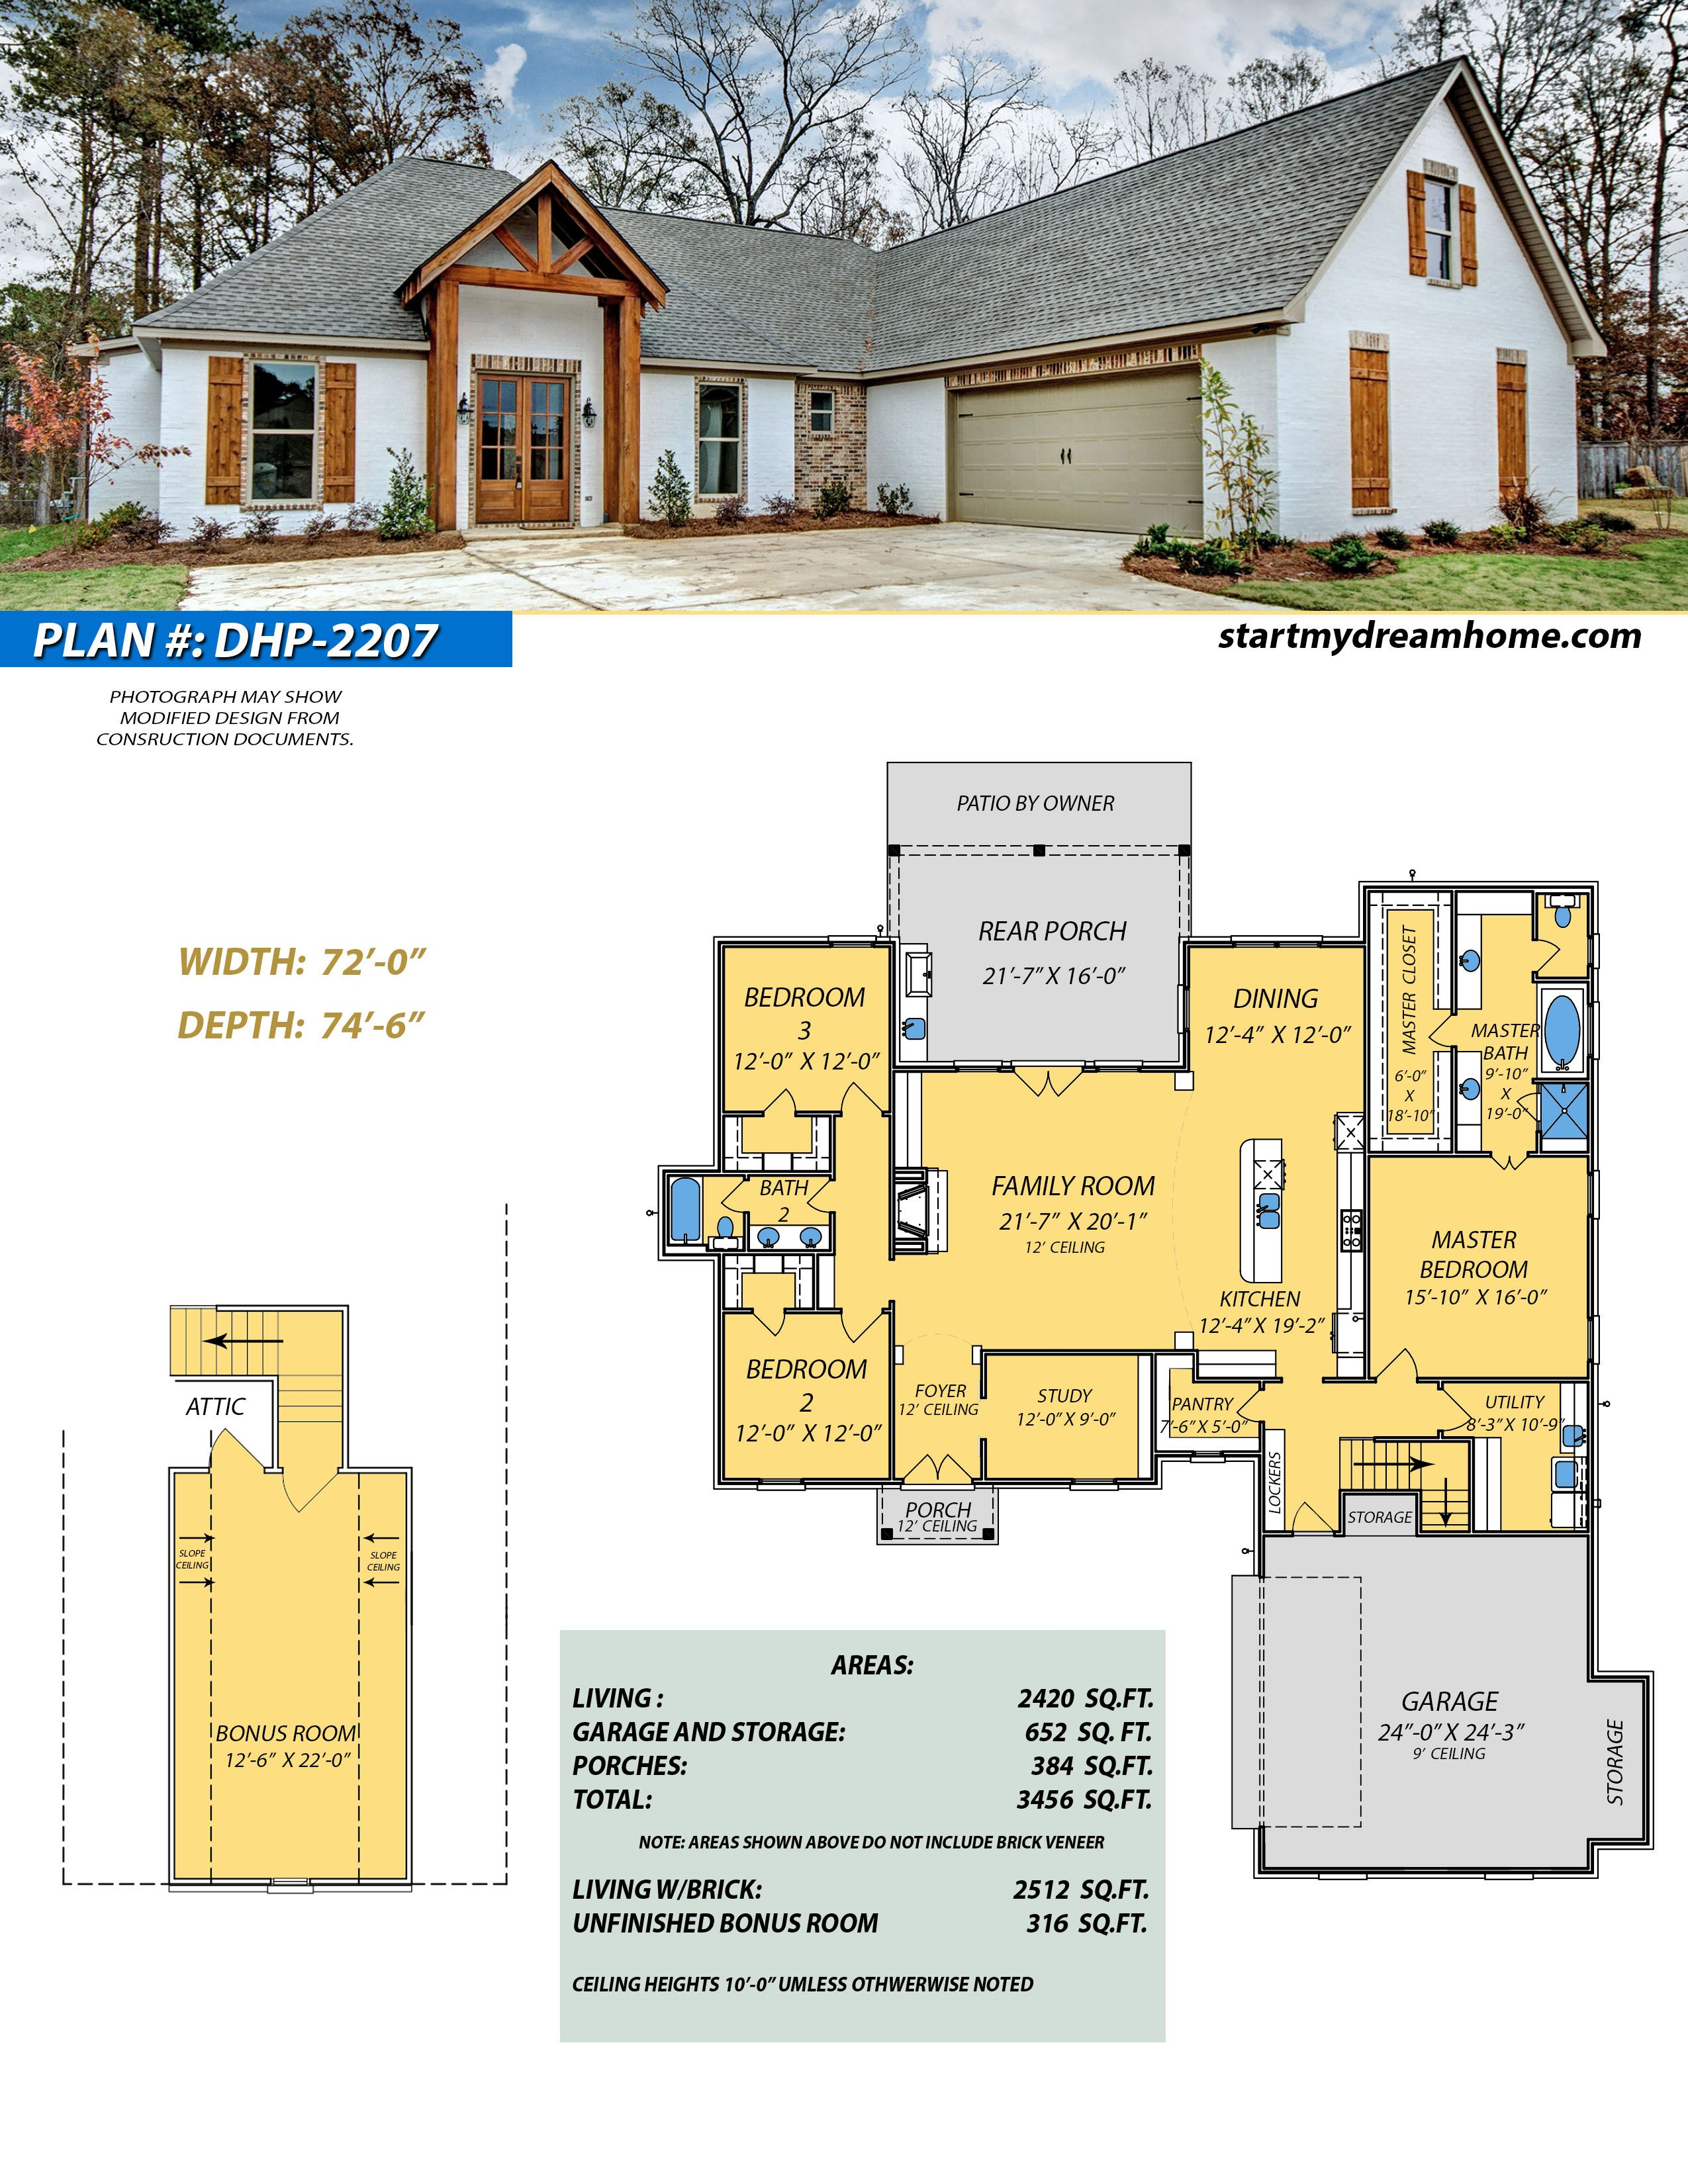 Dream Home Plan 2207 Start My Dream Home House Plans House Plan Gallery Dream House